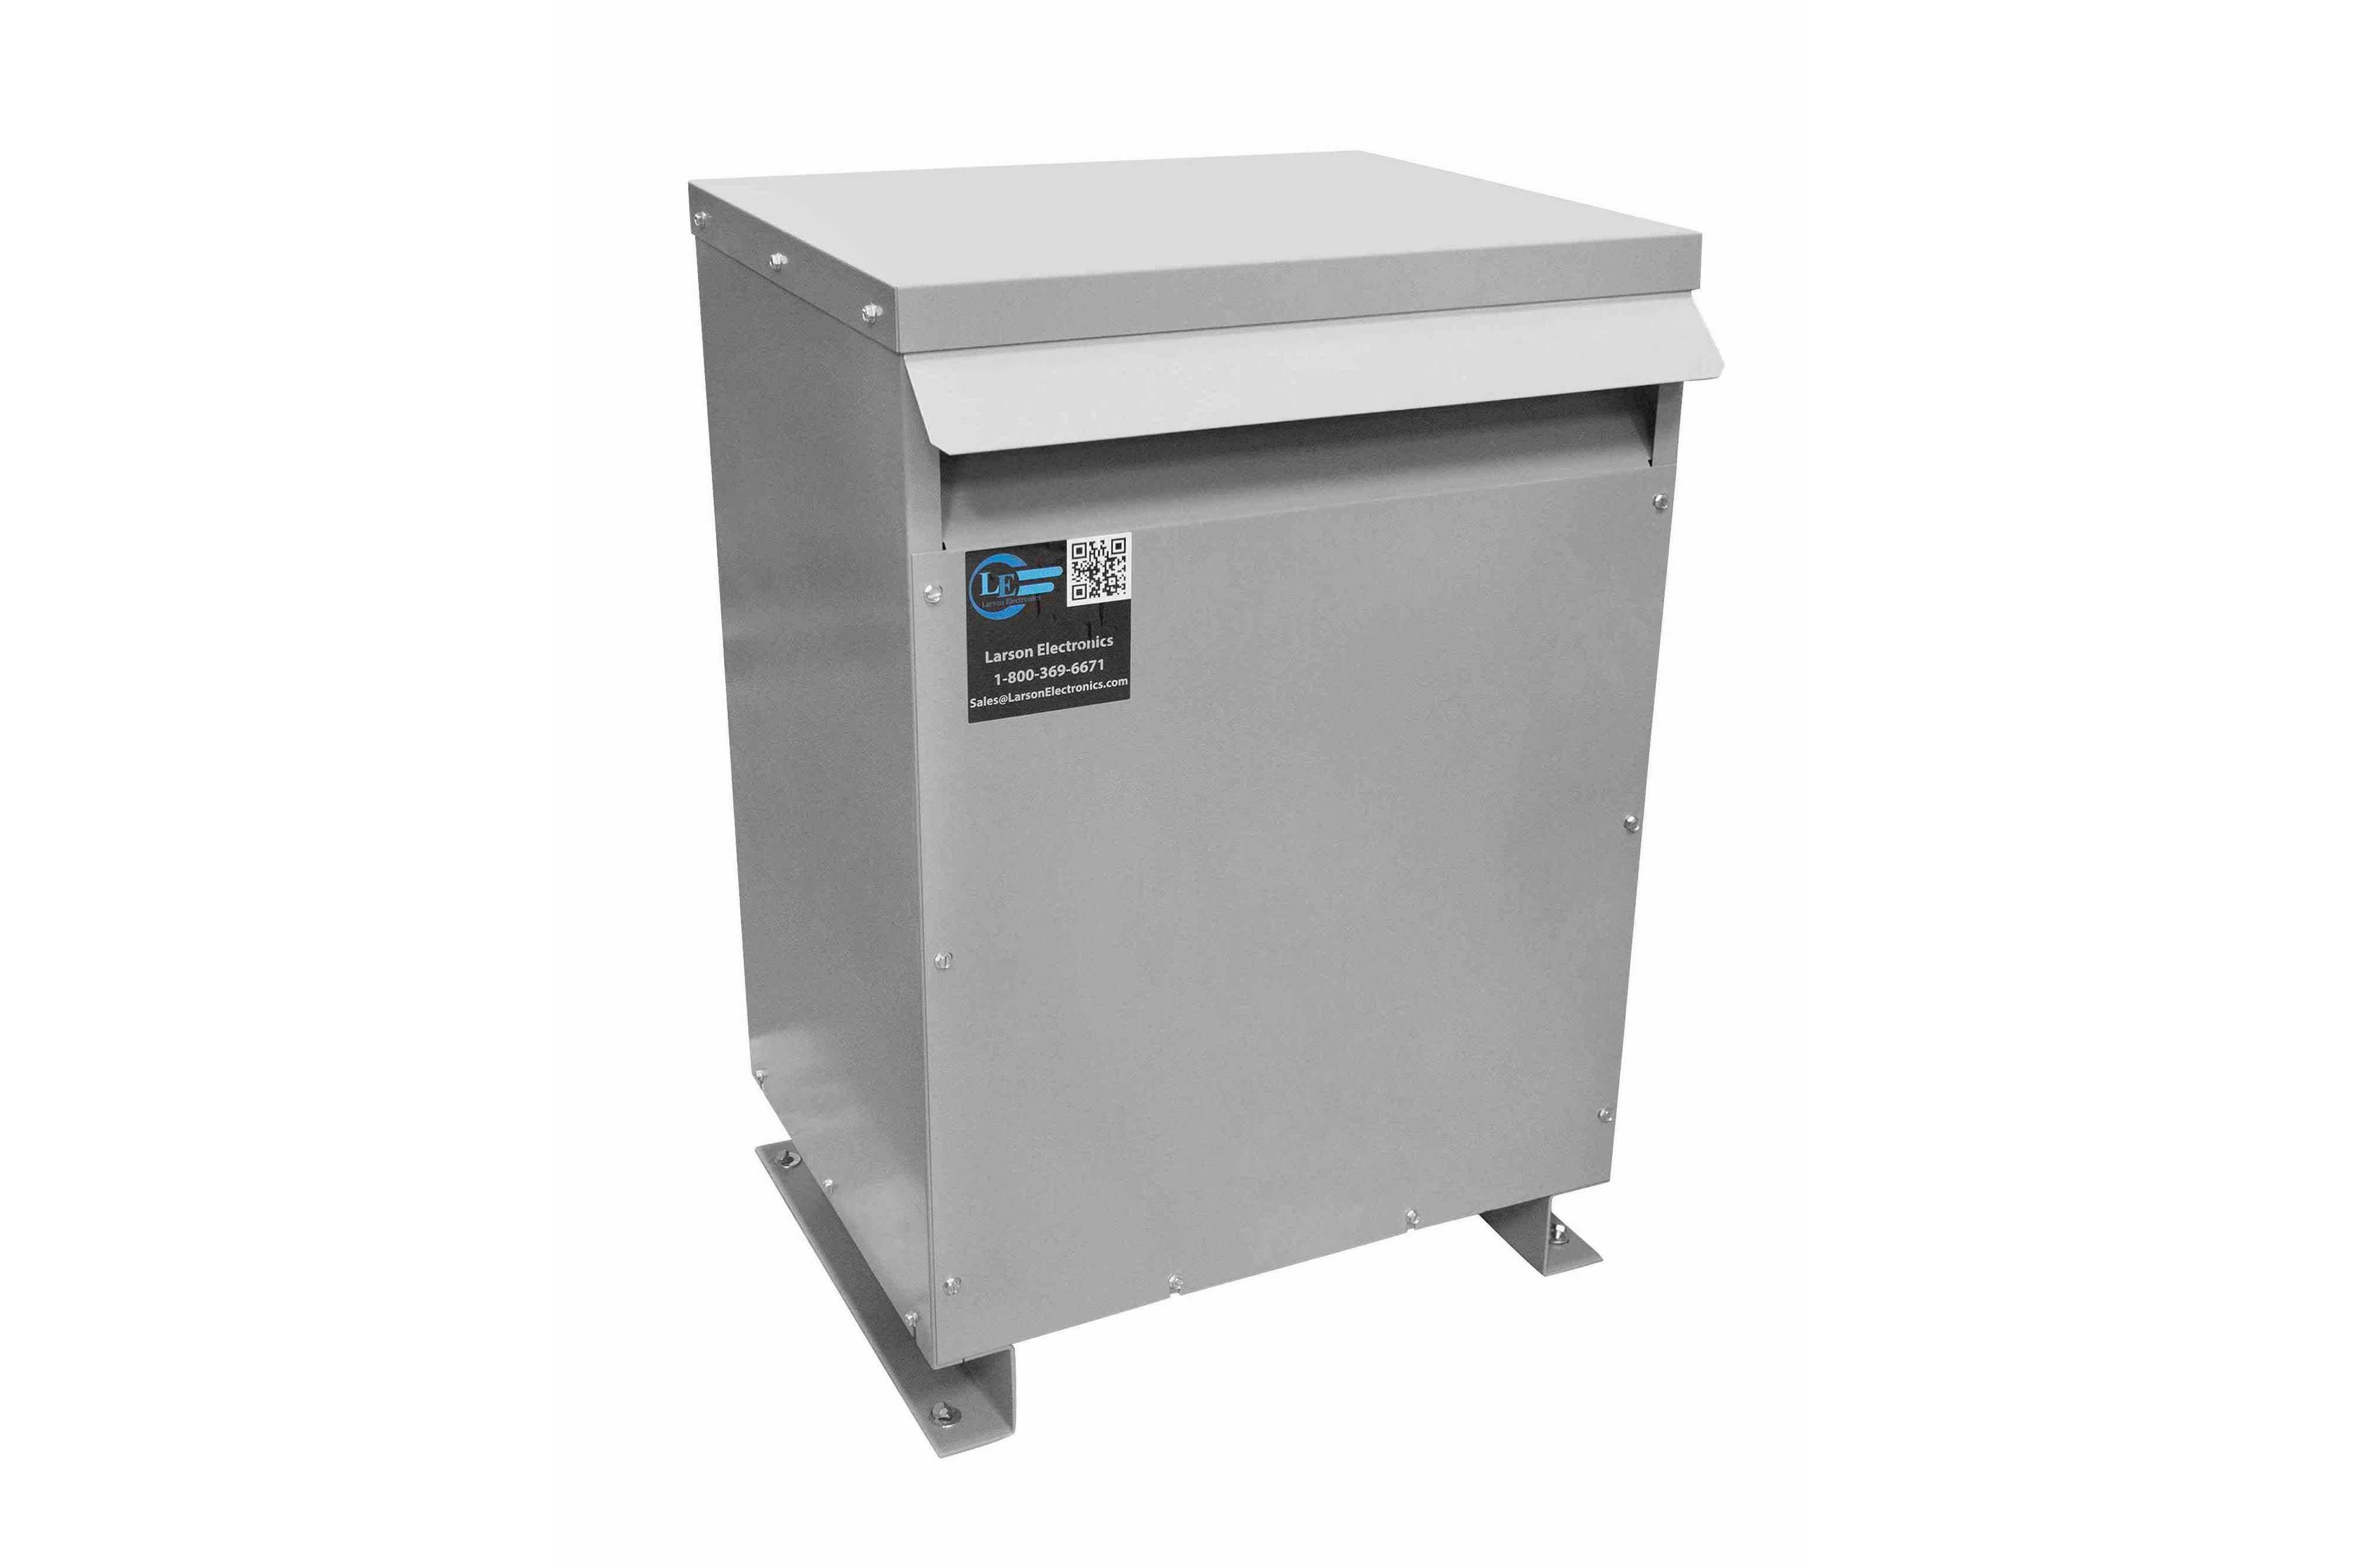 125 kVA 3PH Isolation Transformer, 400V Wye Primary, 600Y/347 Wye-N Secondary, N3R, Ventilated, 60 Hz